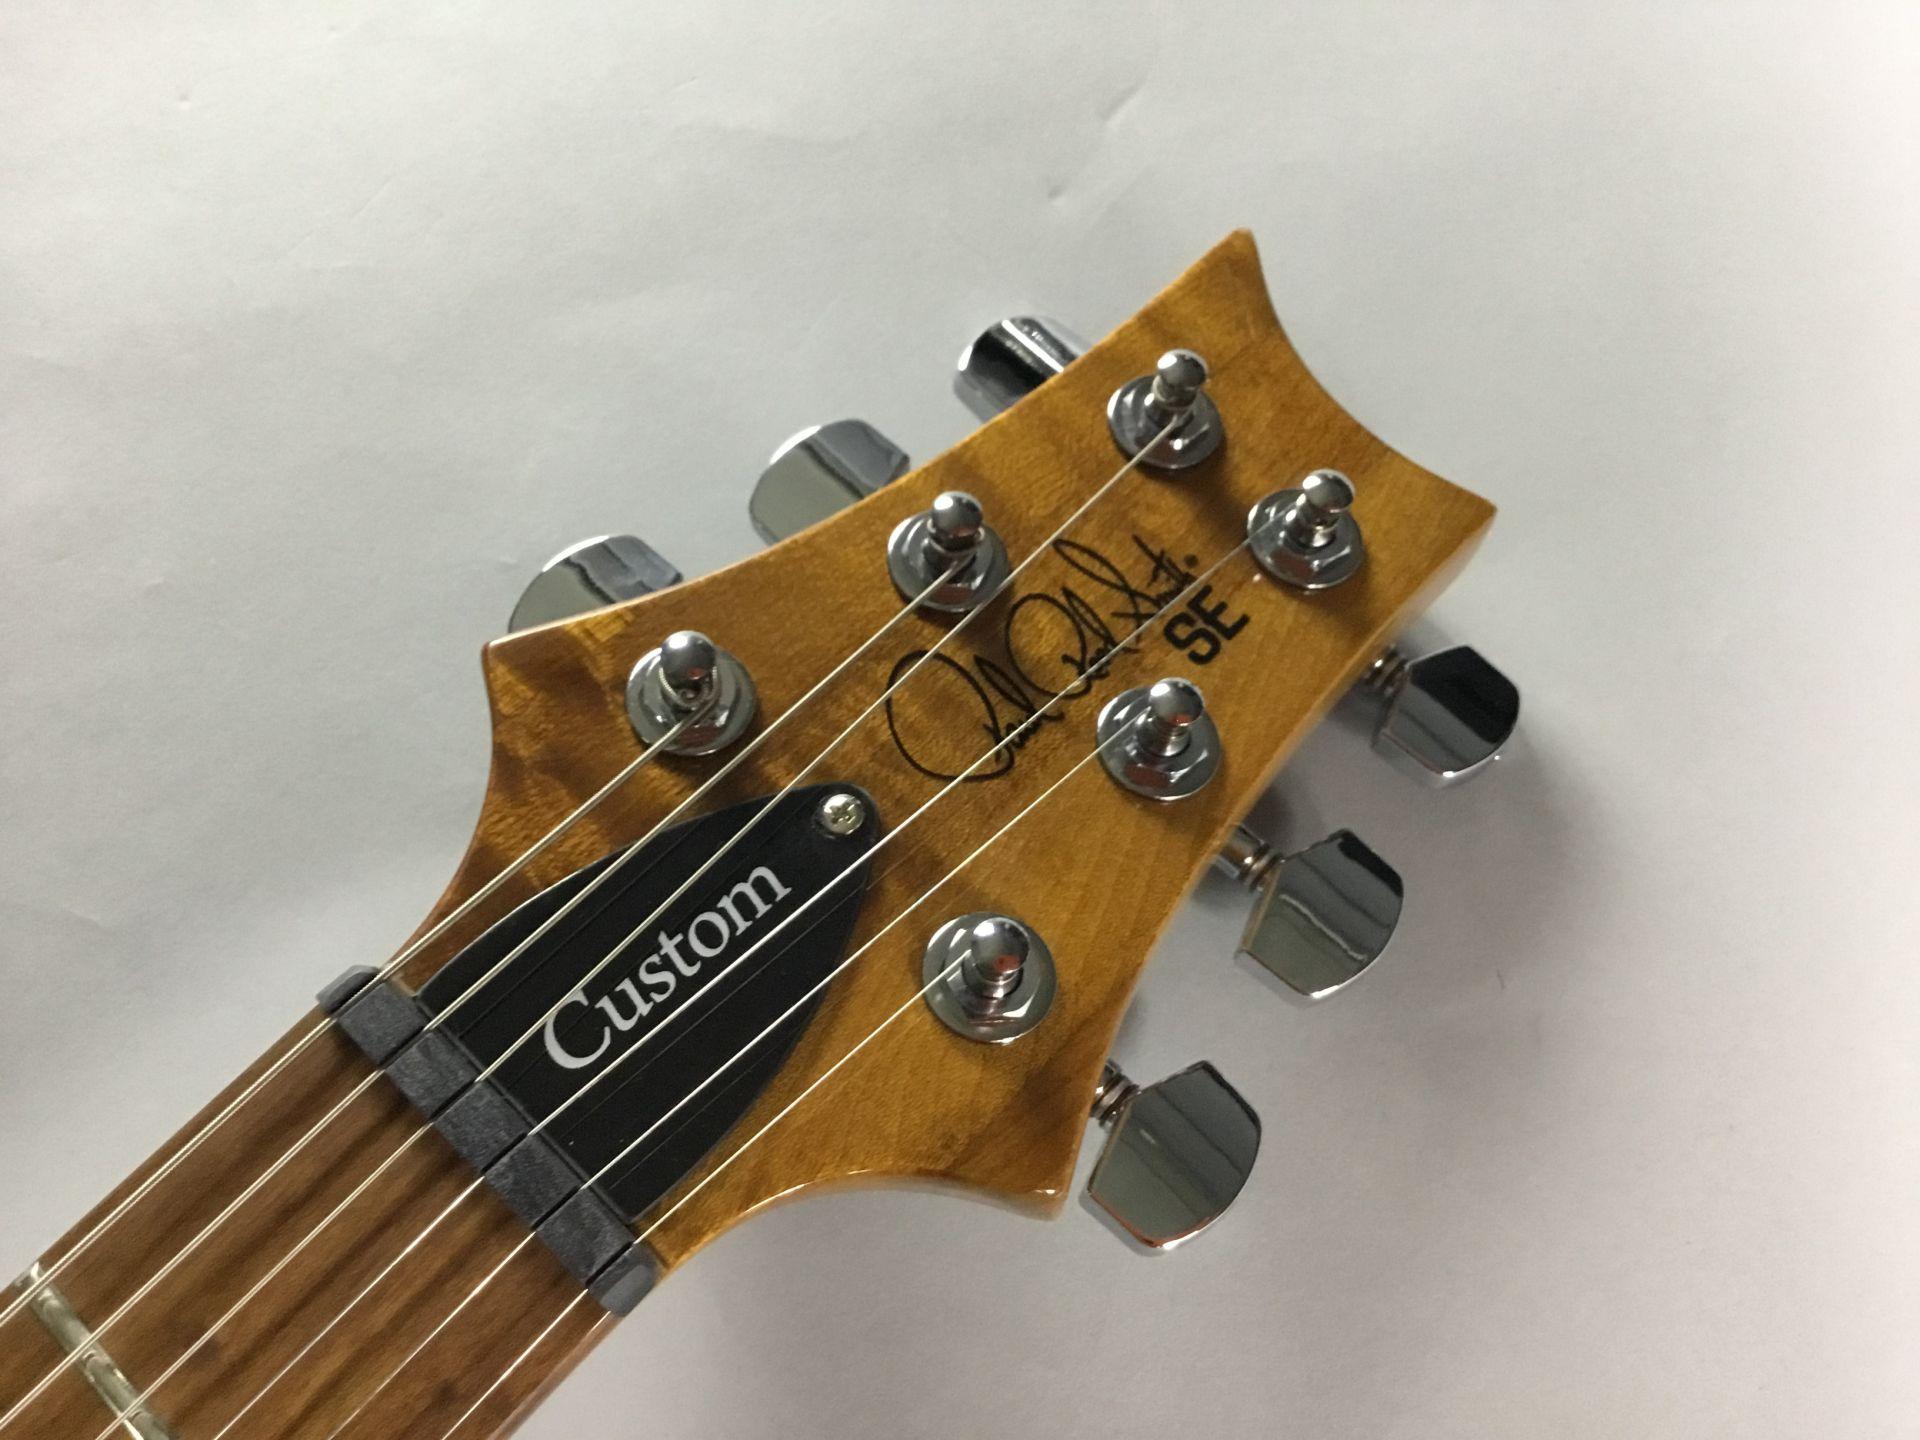 SE Custom 24 Rasted Maple【限定品】のヘッド画像